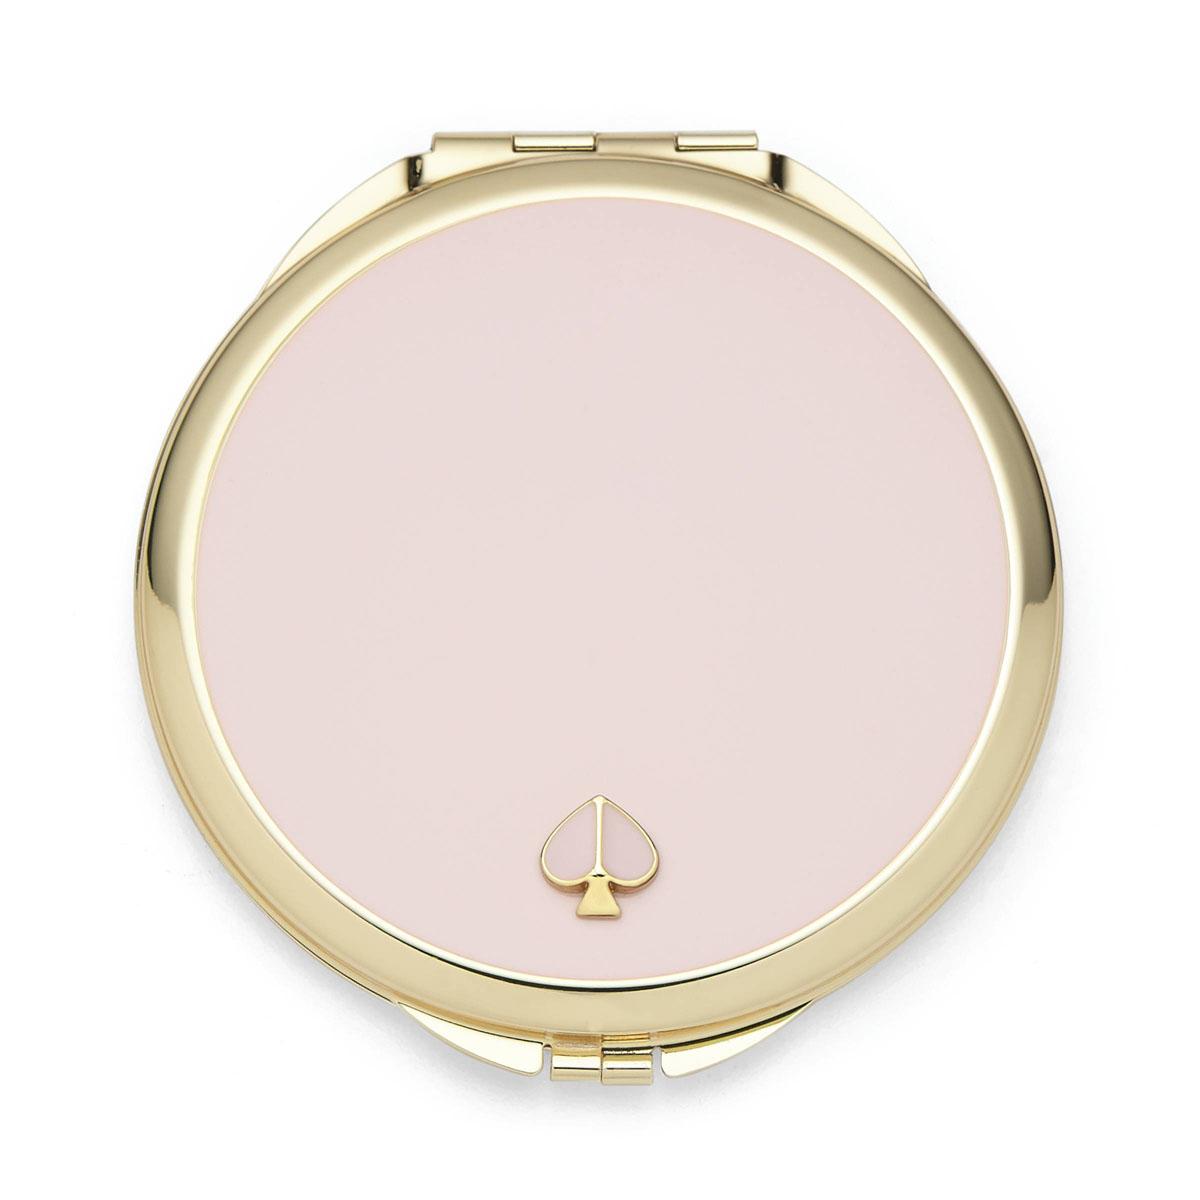 kate spade new york Lenox Spade Street Gold Compact , Blush